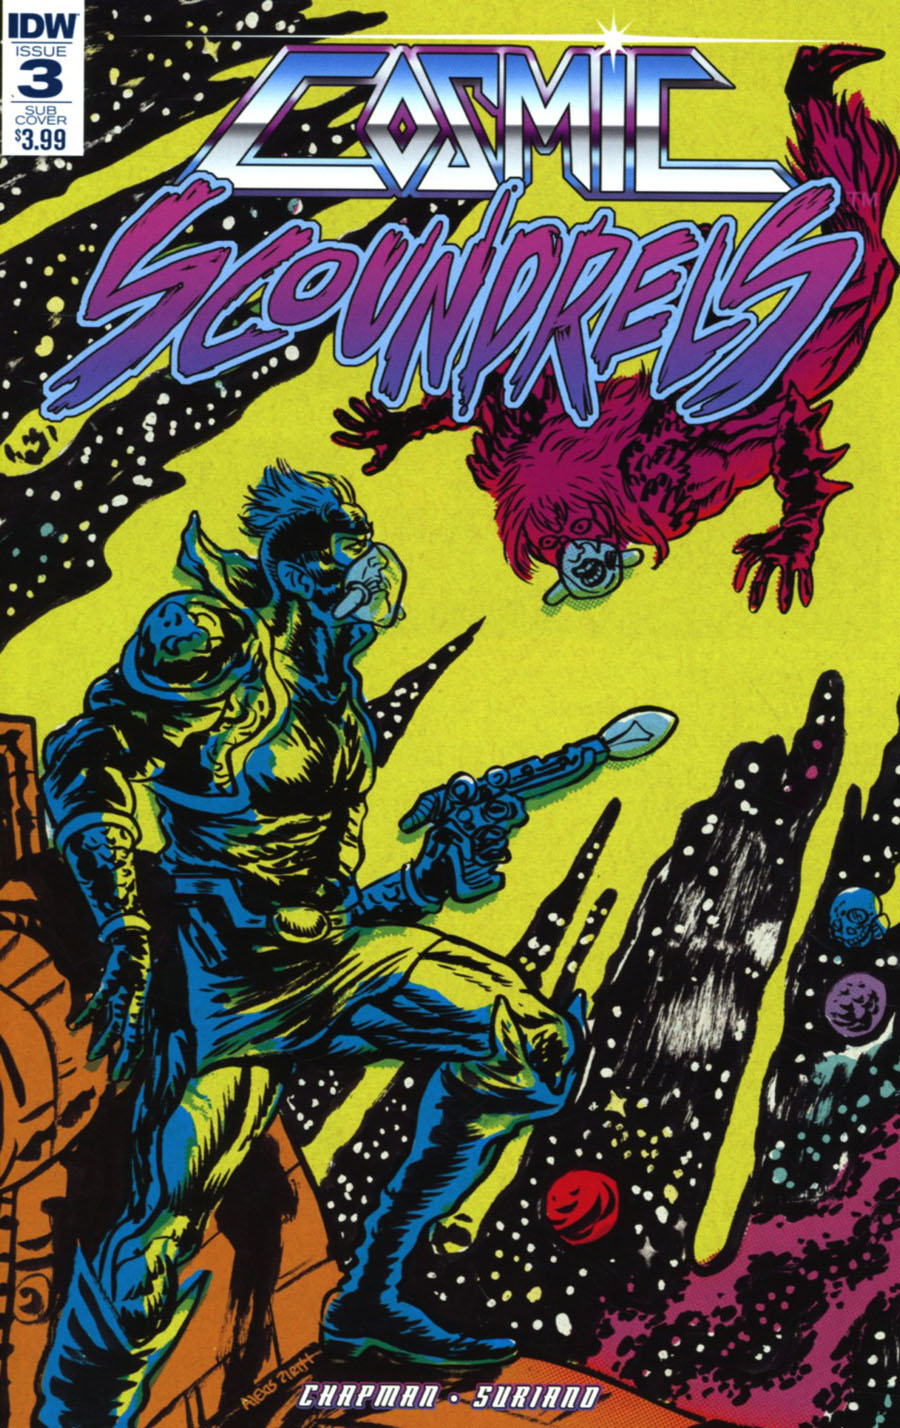 Cosmic Scoundrels #3 Cover B Variant Alexis Ziritt Subscription Cover